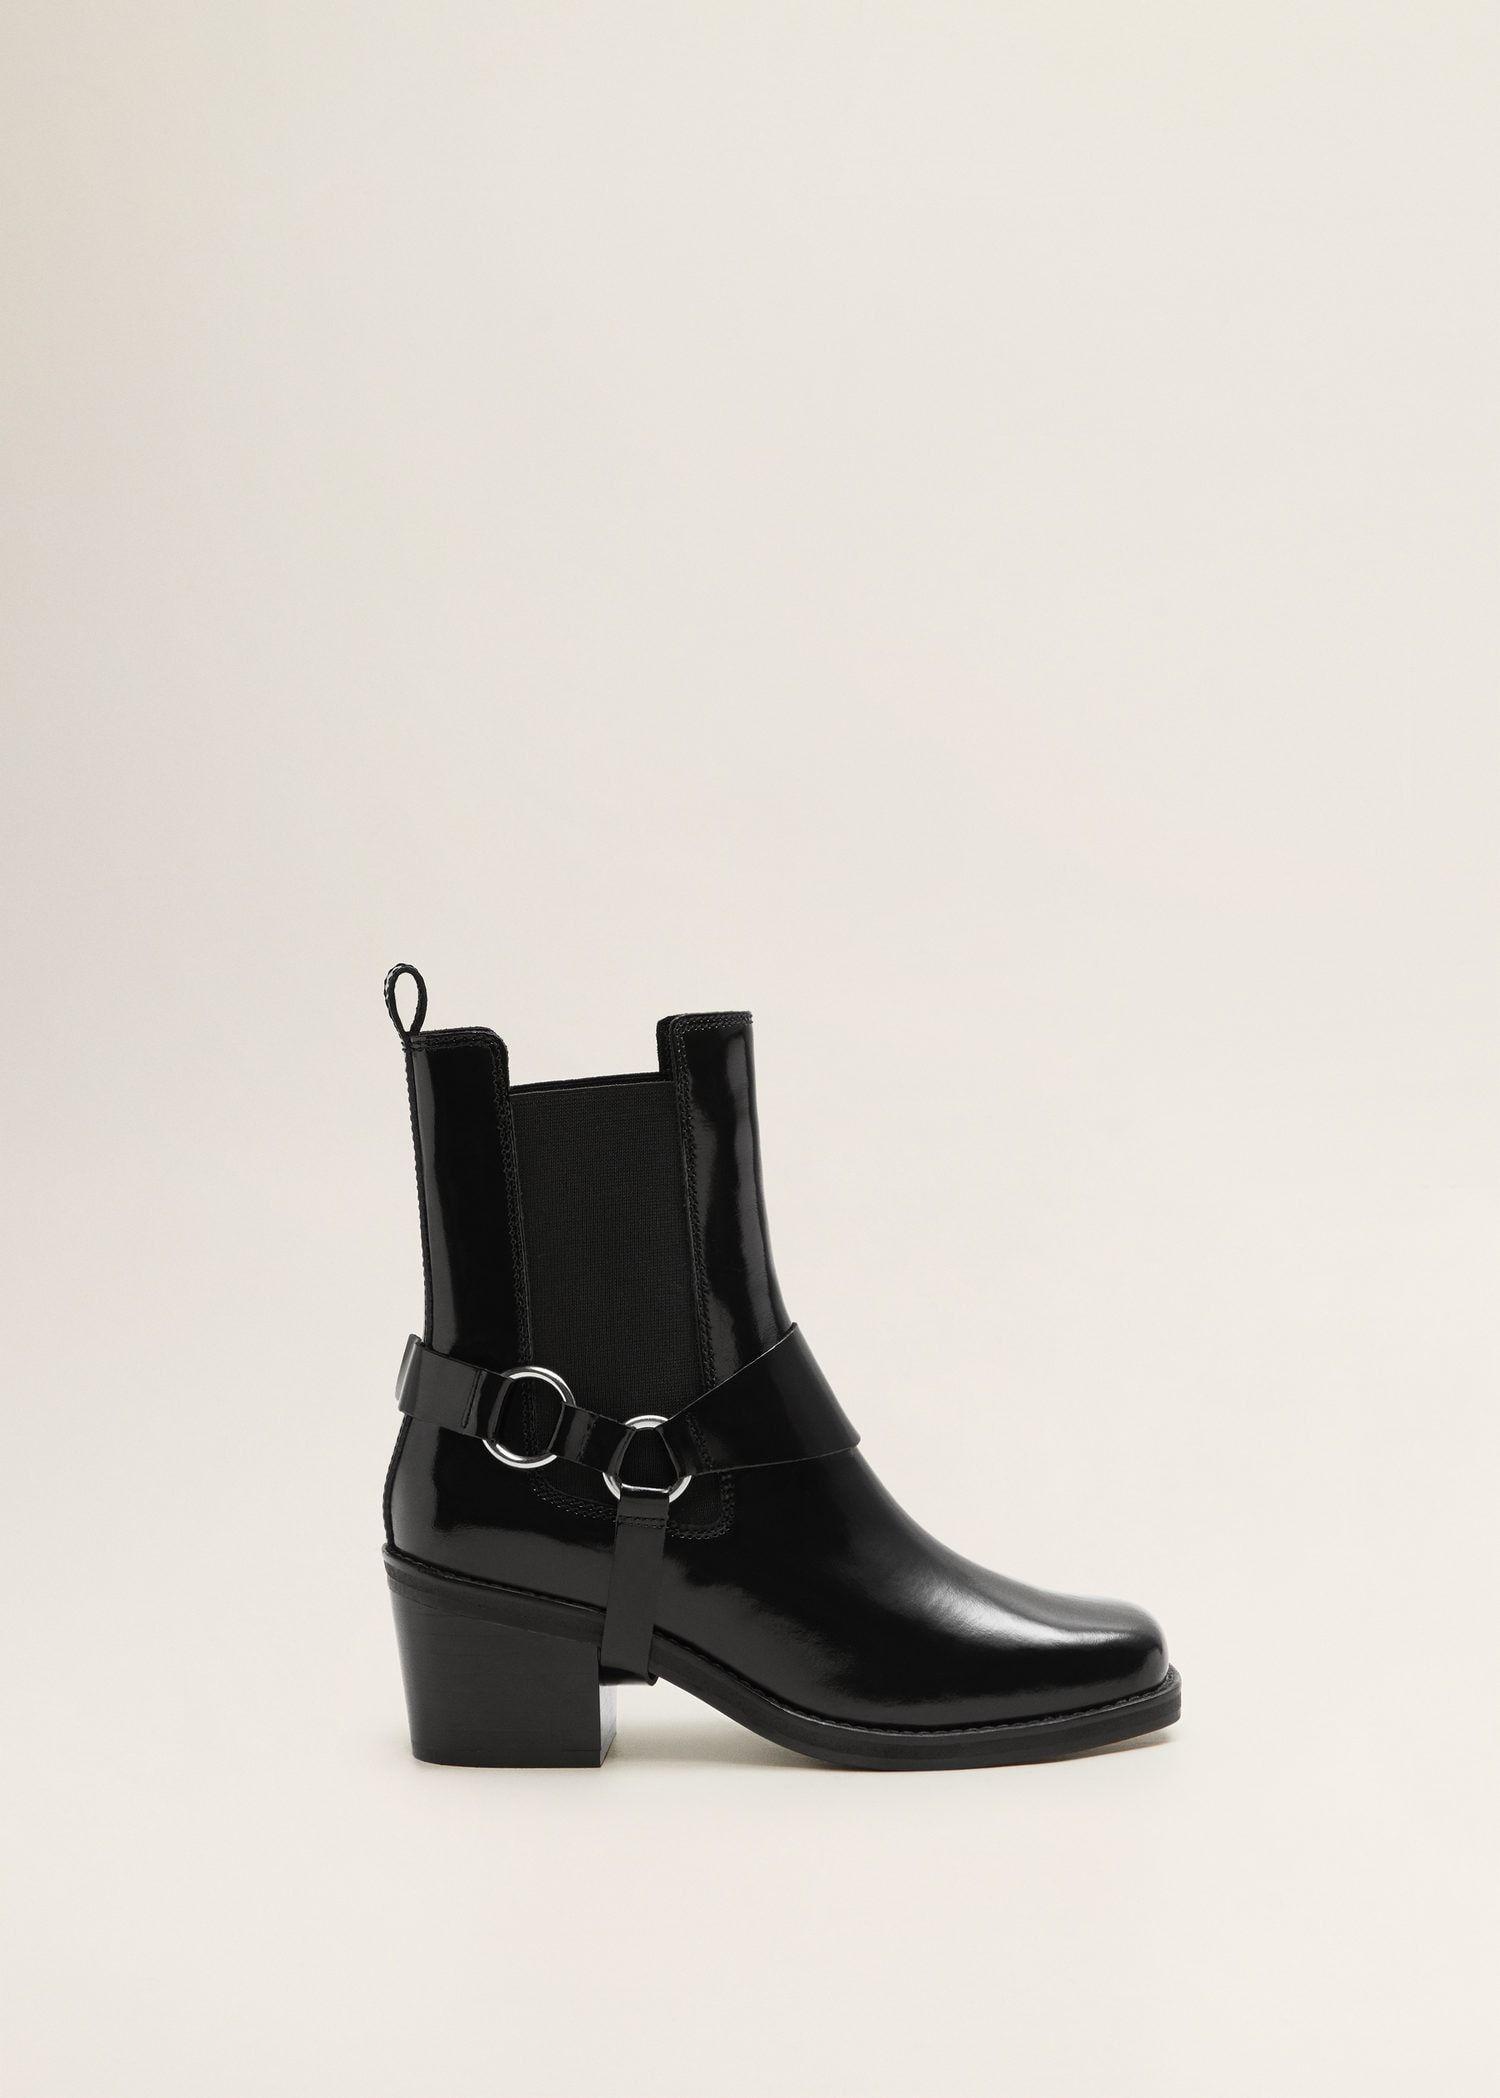 Skorzane Botki Z Klamerkami Kobieta Outlet Polska Boots Womens Boots Ankle Buckle Ankle Boots